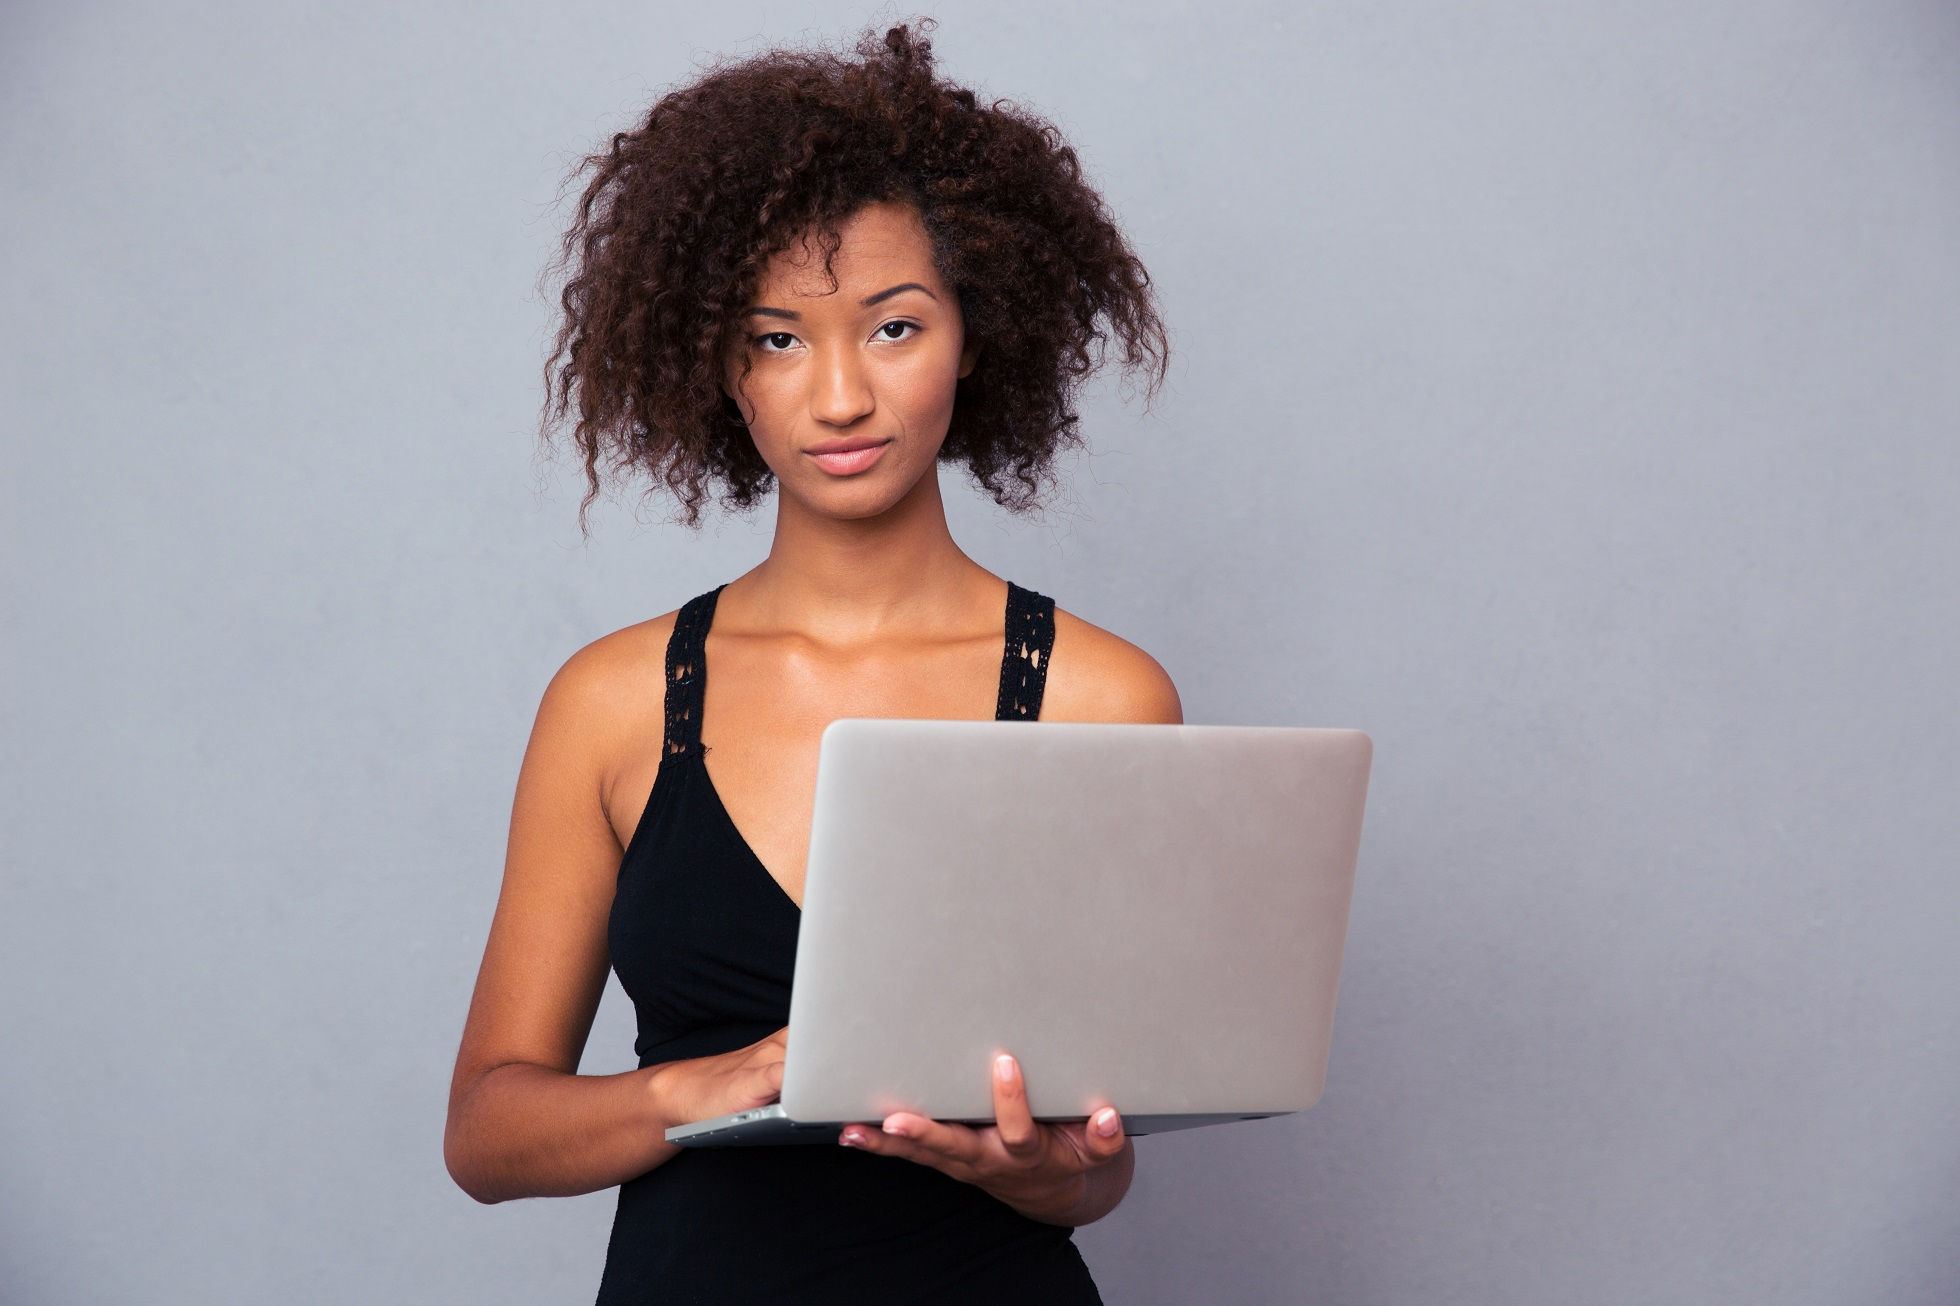 Afro american woman using laptop